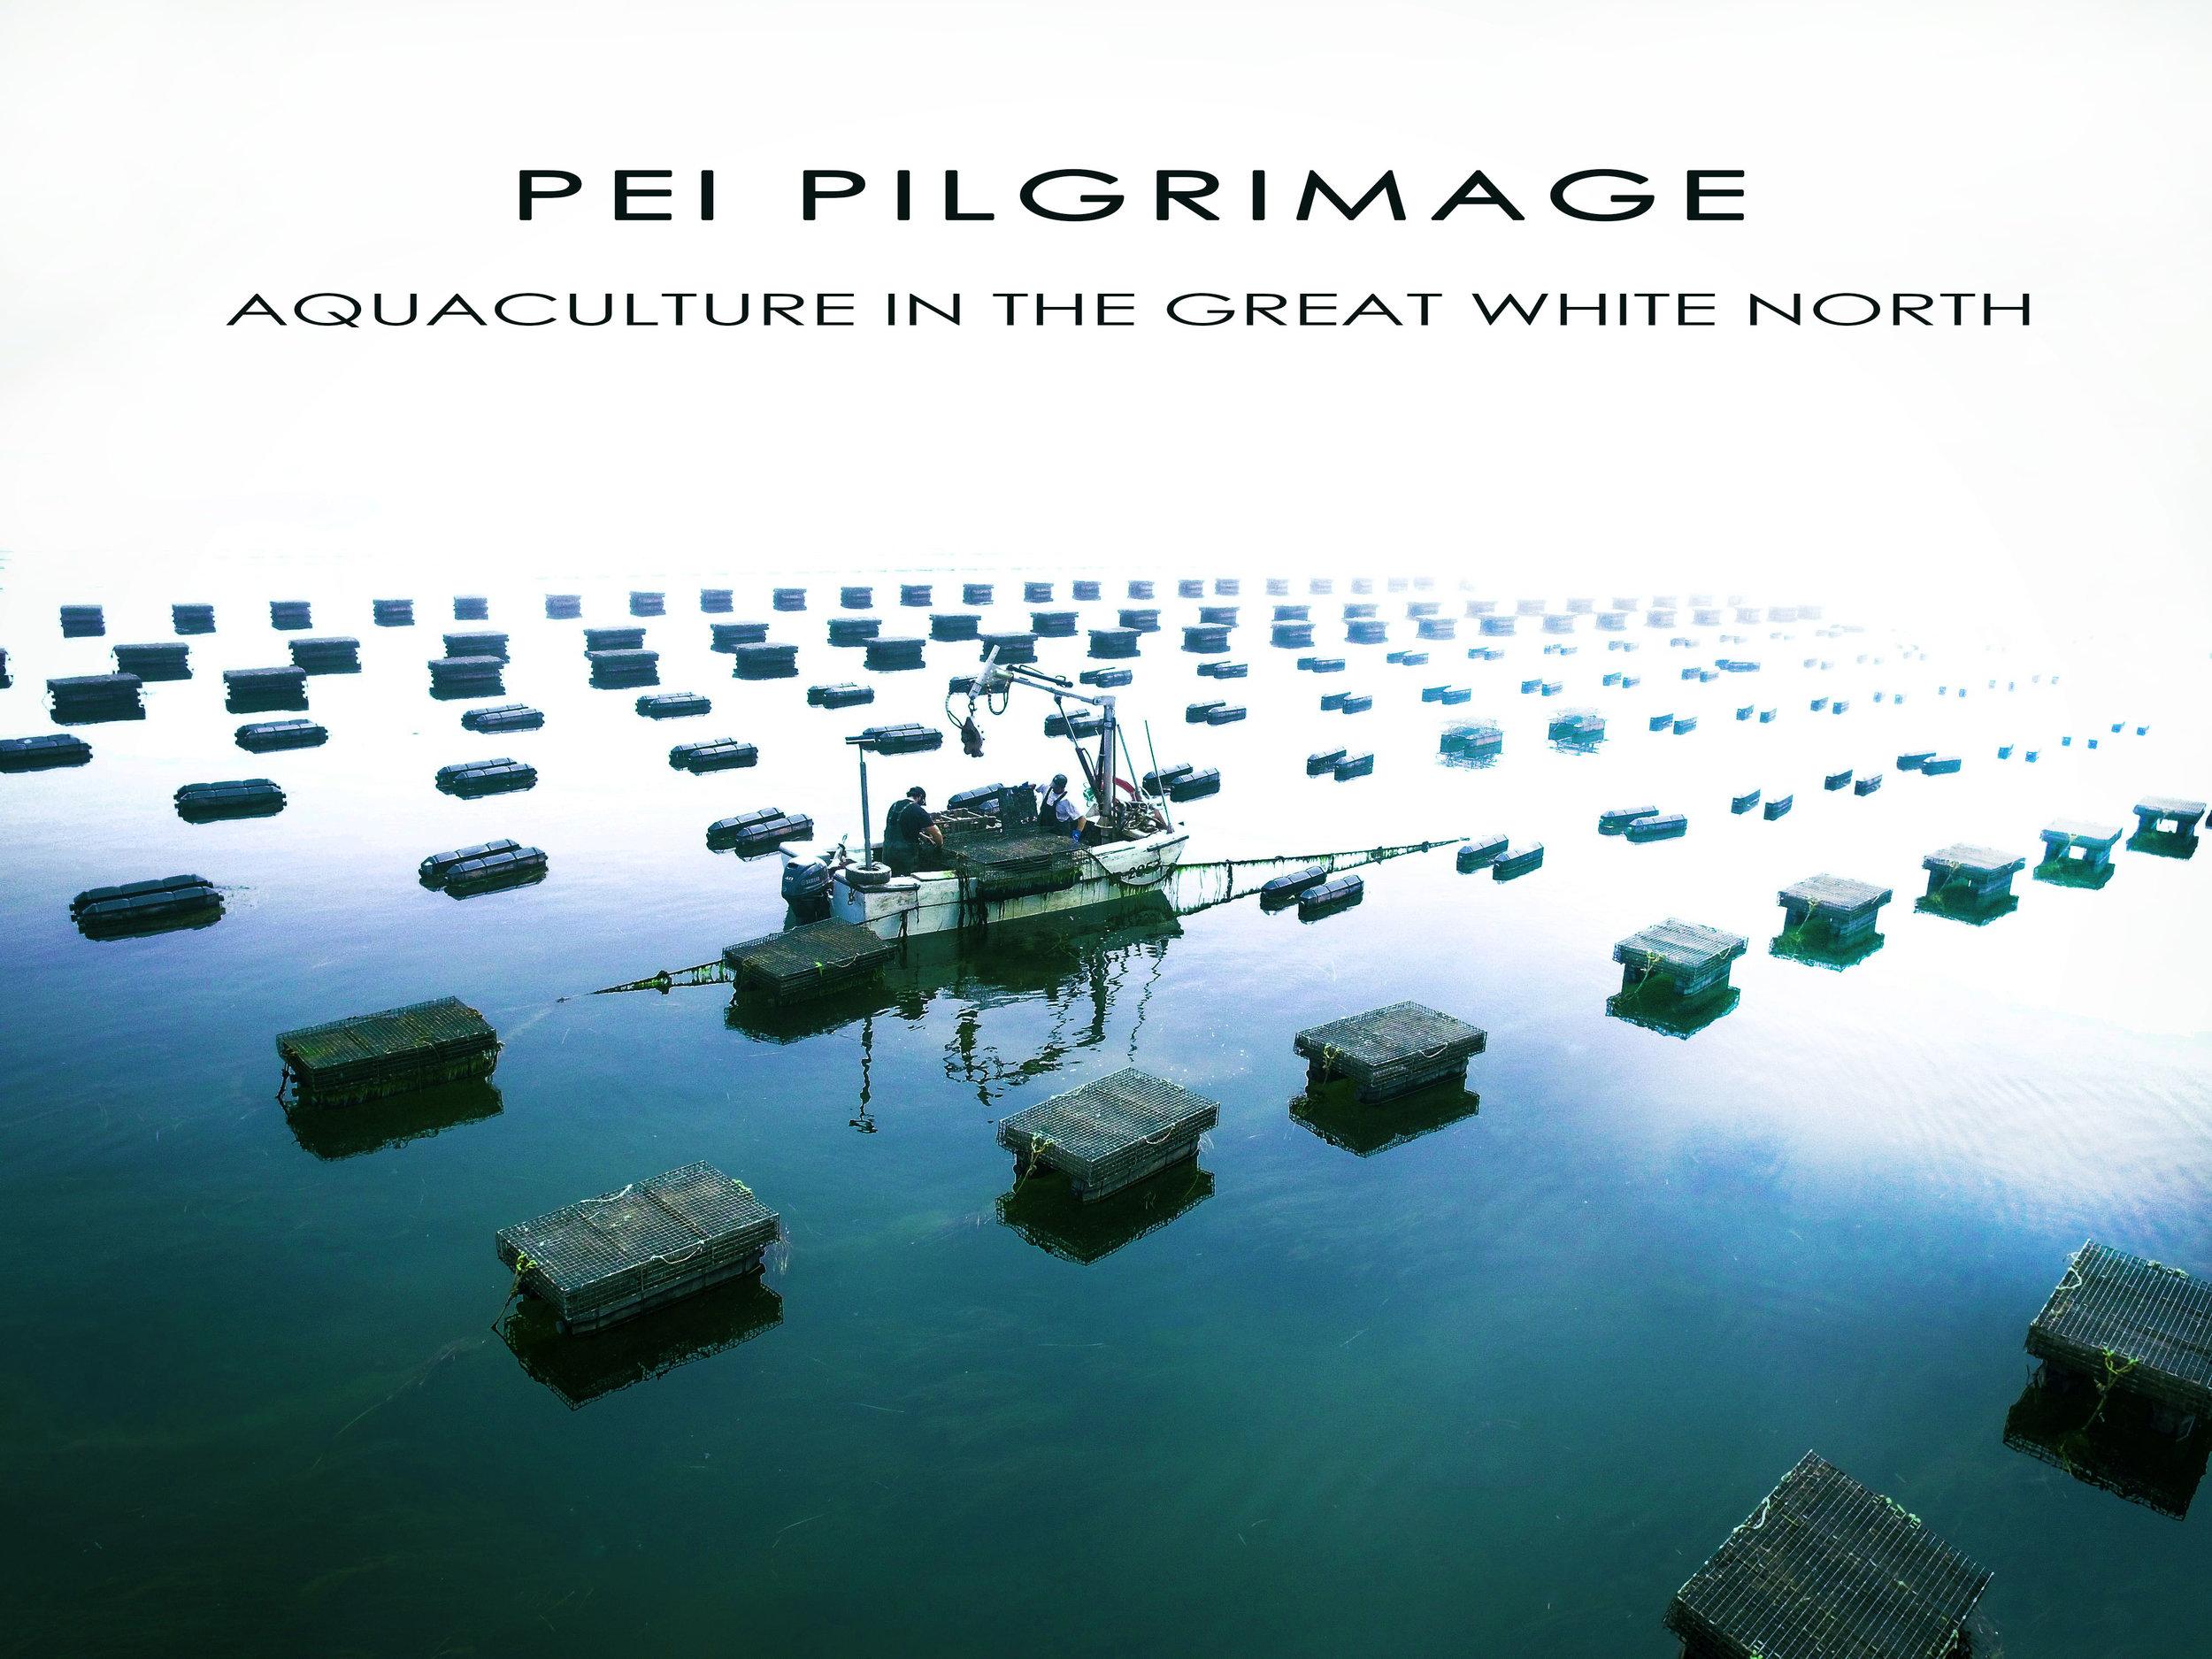 PEI Pilgrimage.jpg